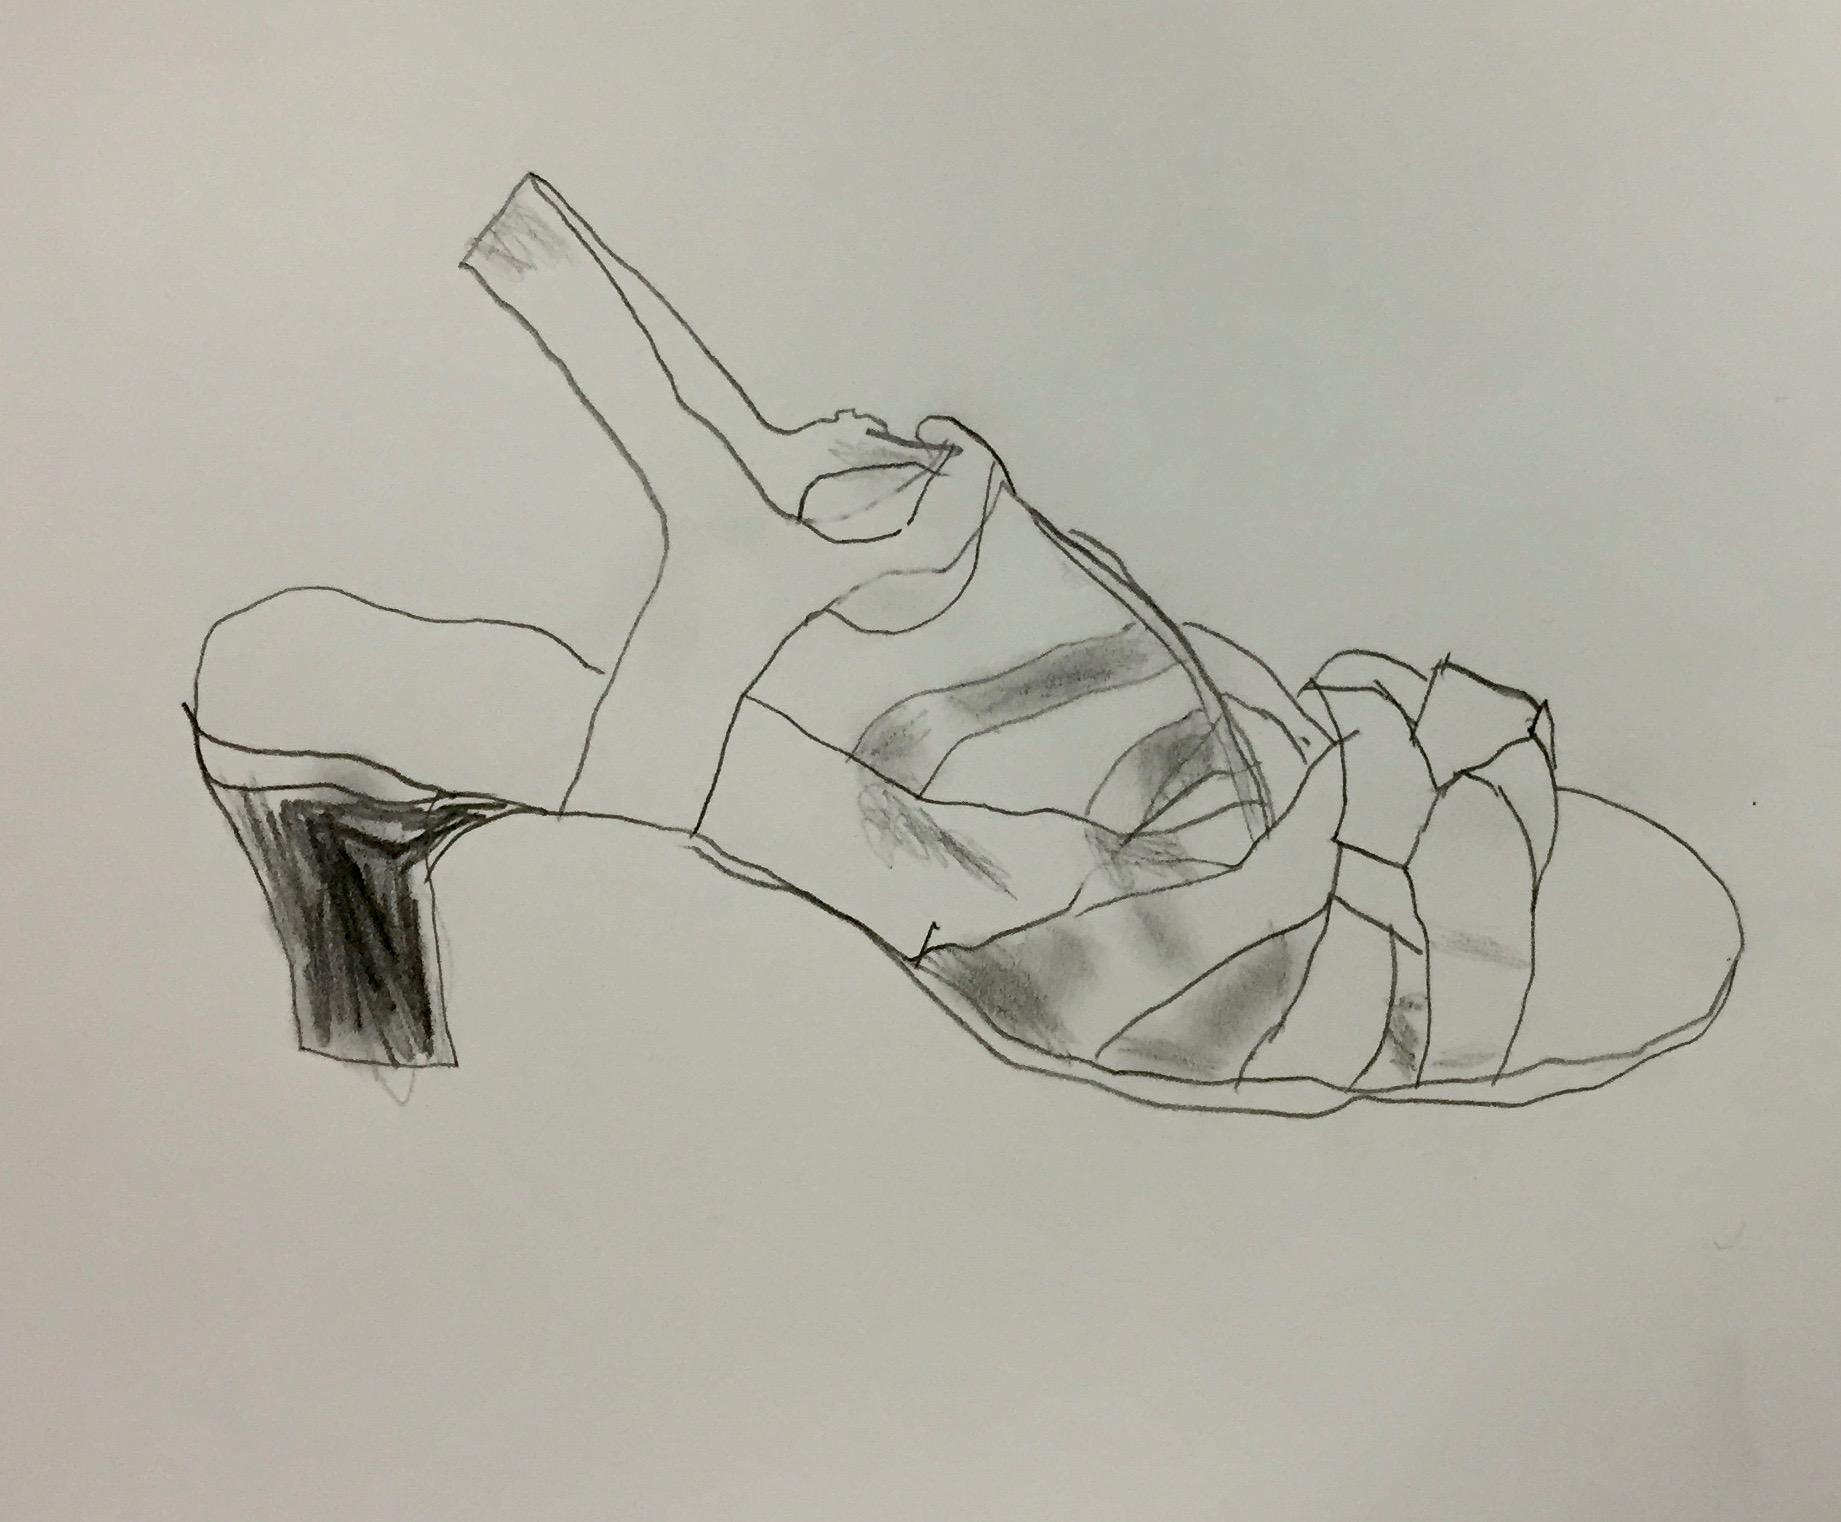 Contour Line Drawing Of A Shoe : Contour shoe drawings u2022 corbie arts